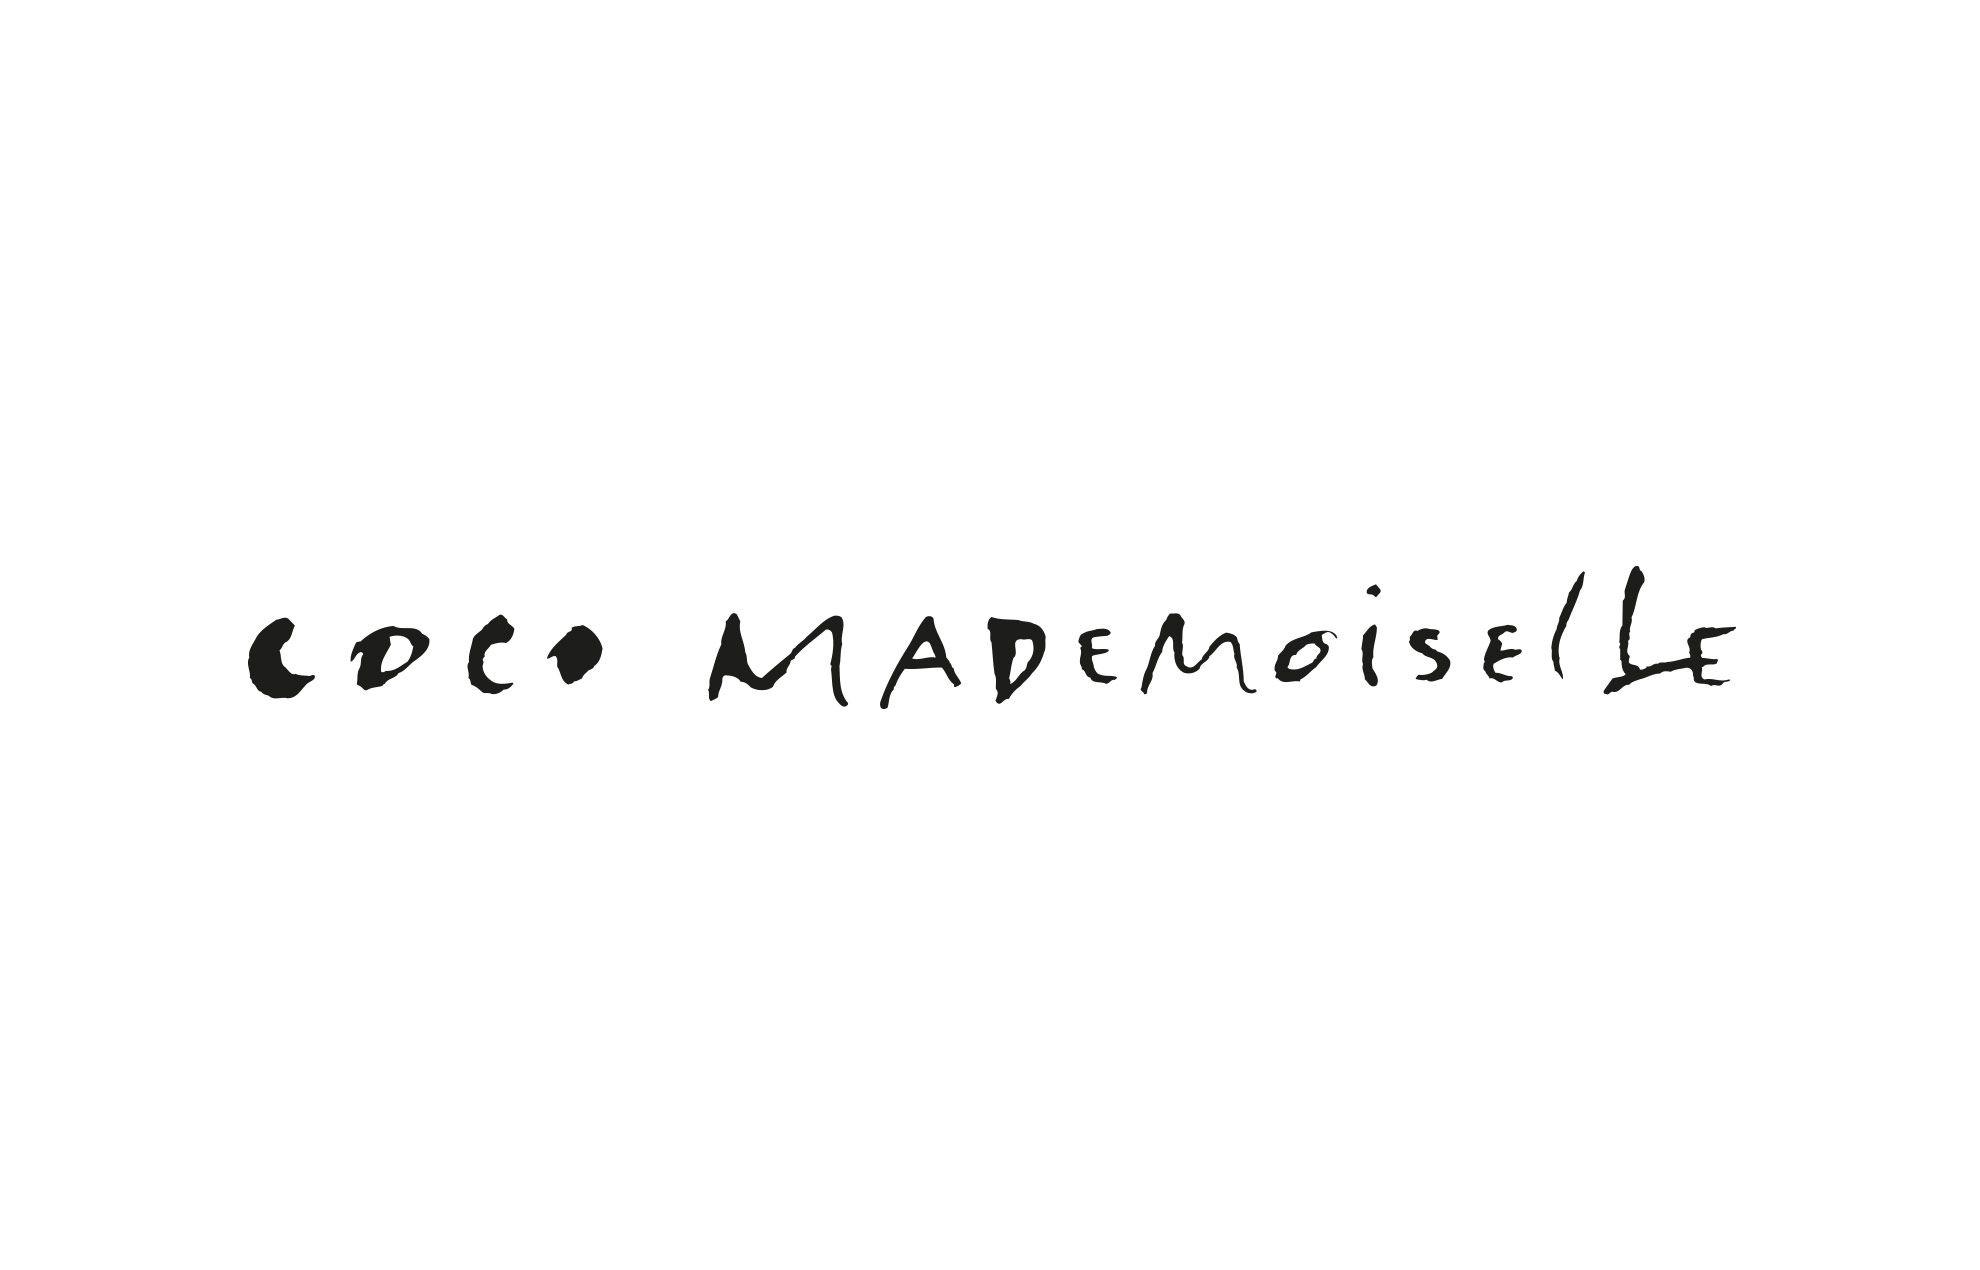 Coco Mademoiselle Chanel Fonts & branding Pinterest